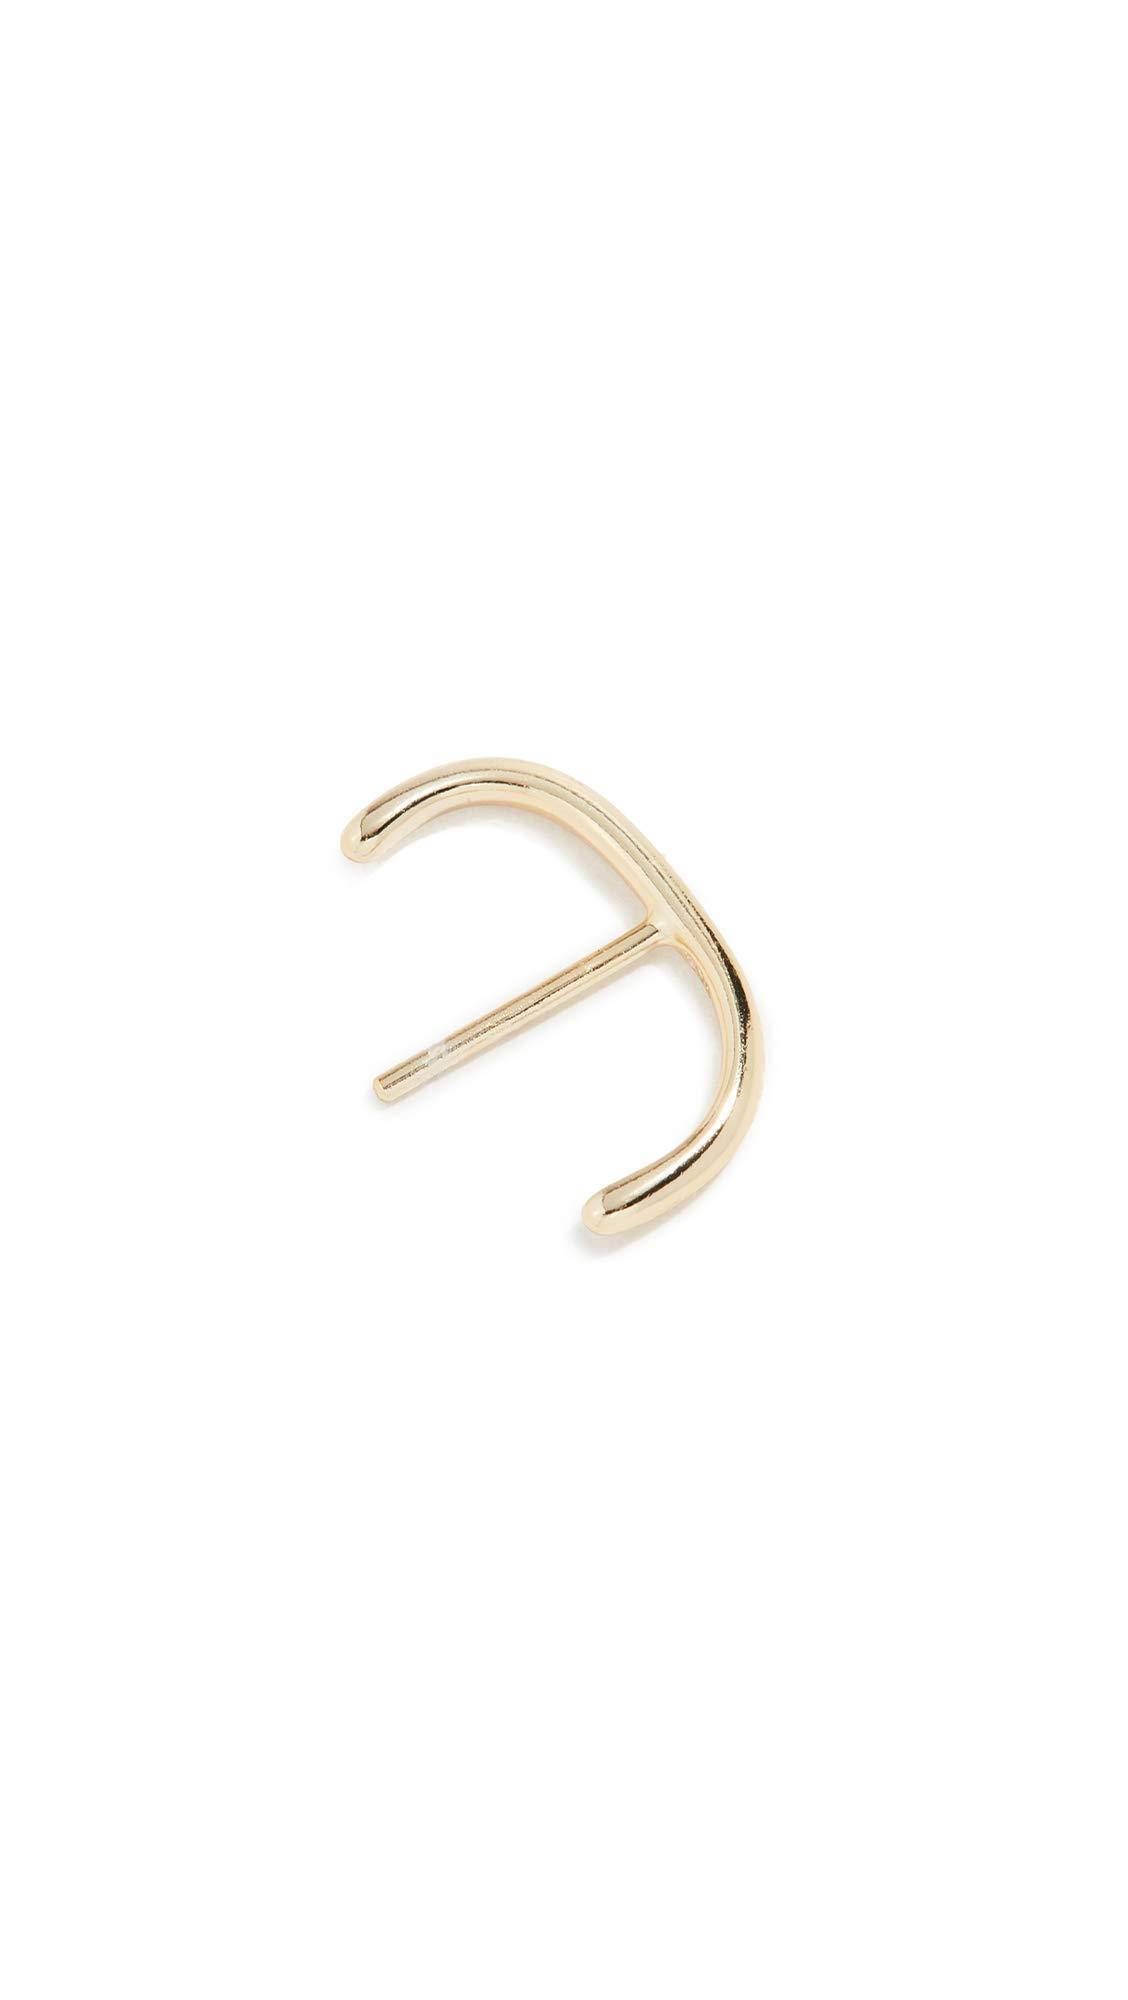 Shashi Women's Ford Stud Cuff, Gold, One Size